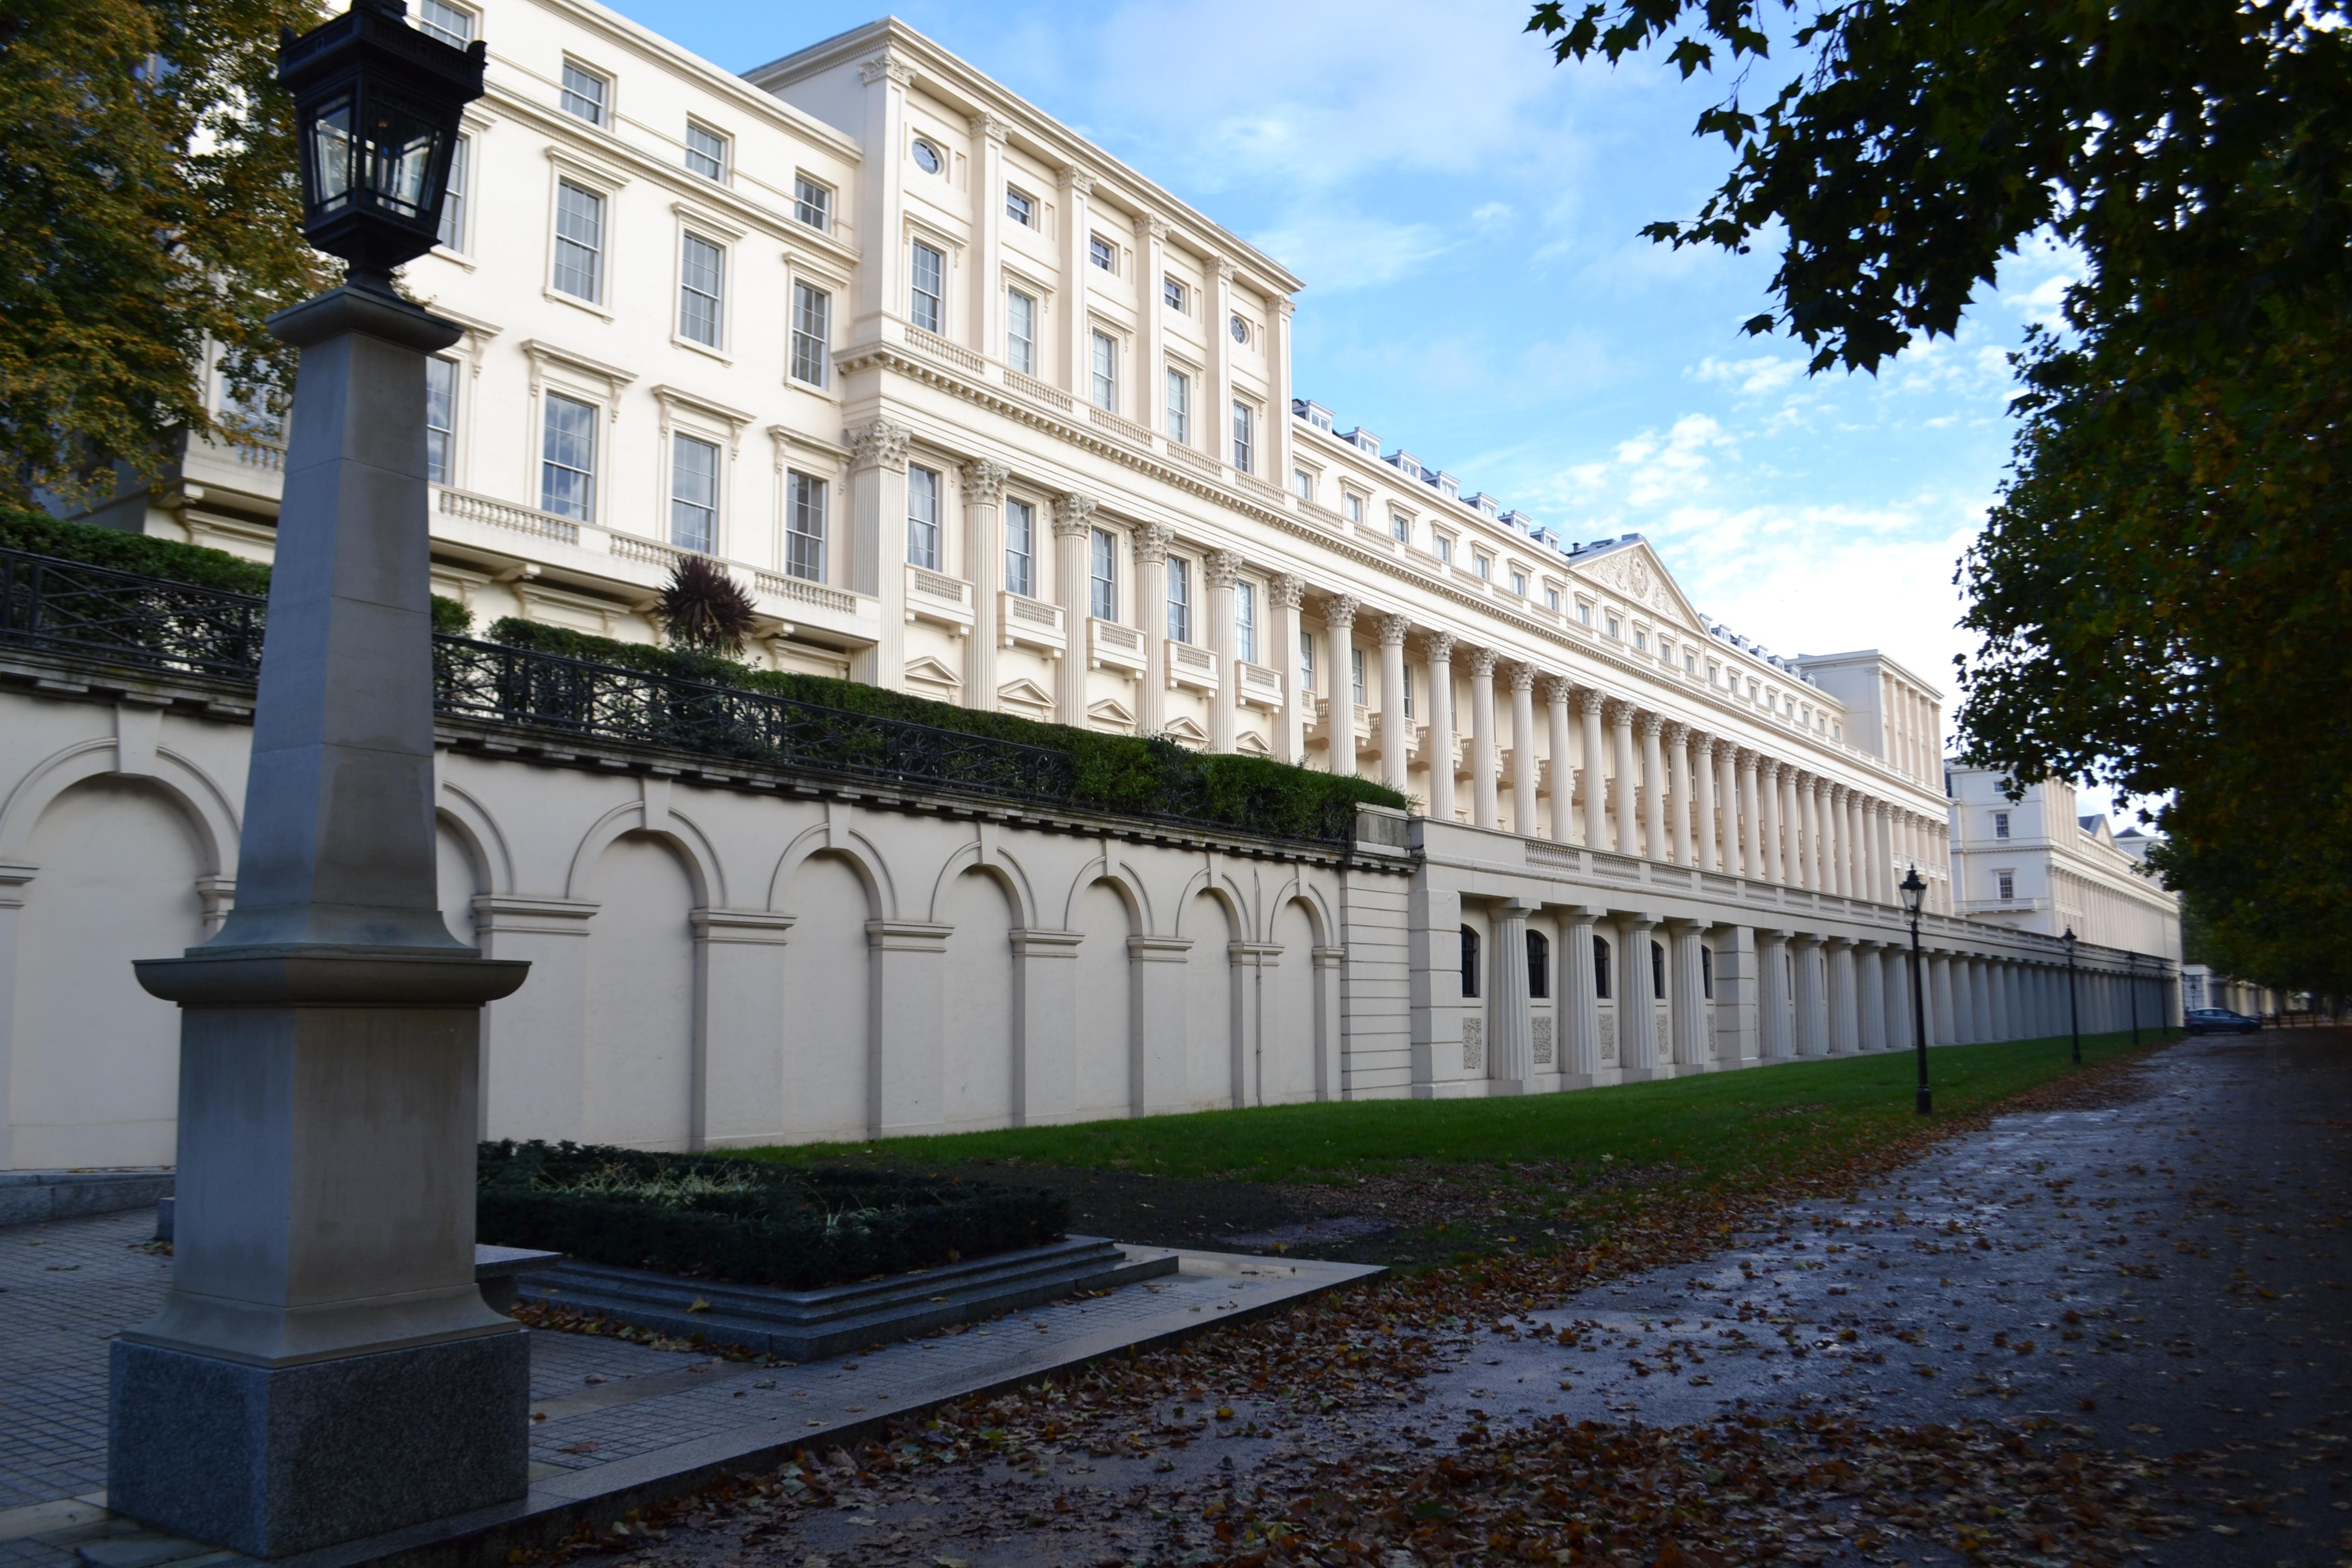 File carlton house wikimedia commons for 18 carlton house terrace